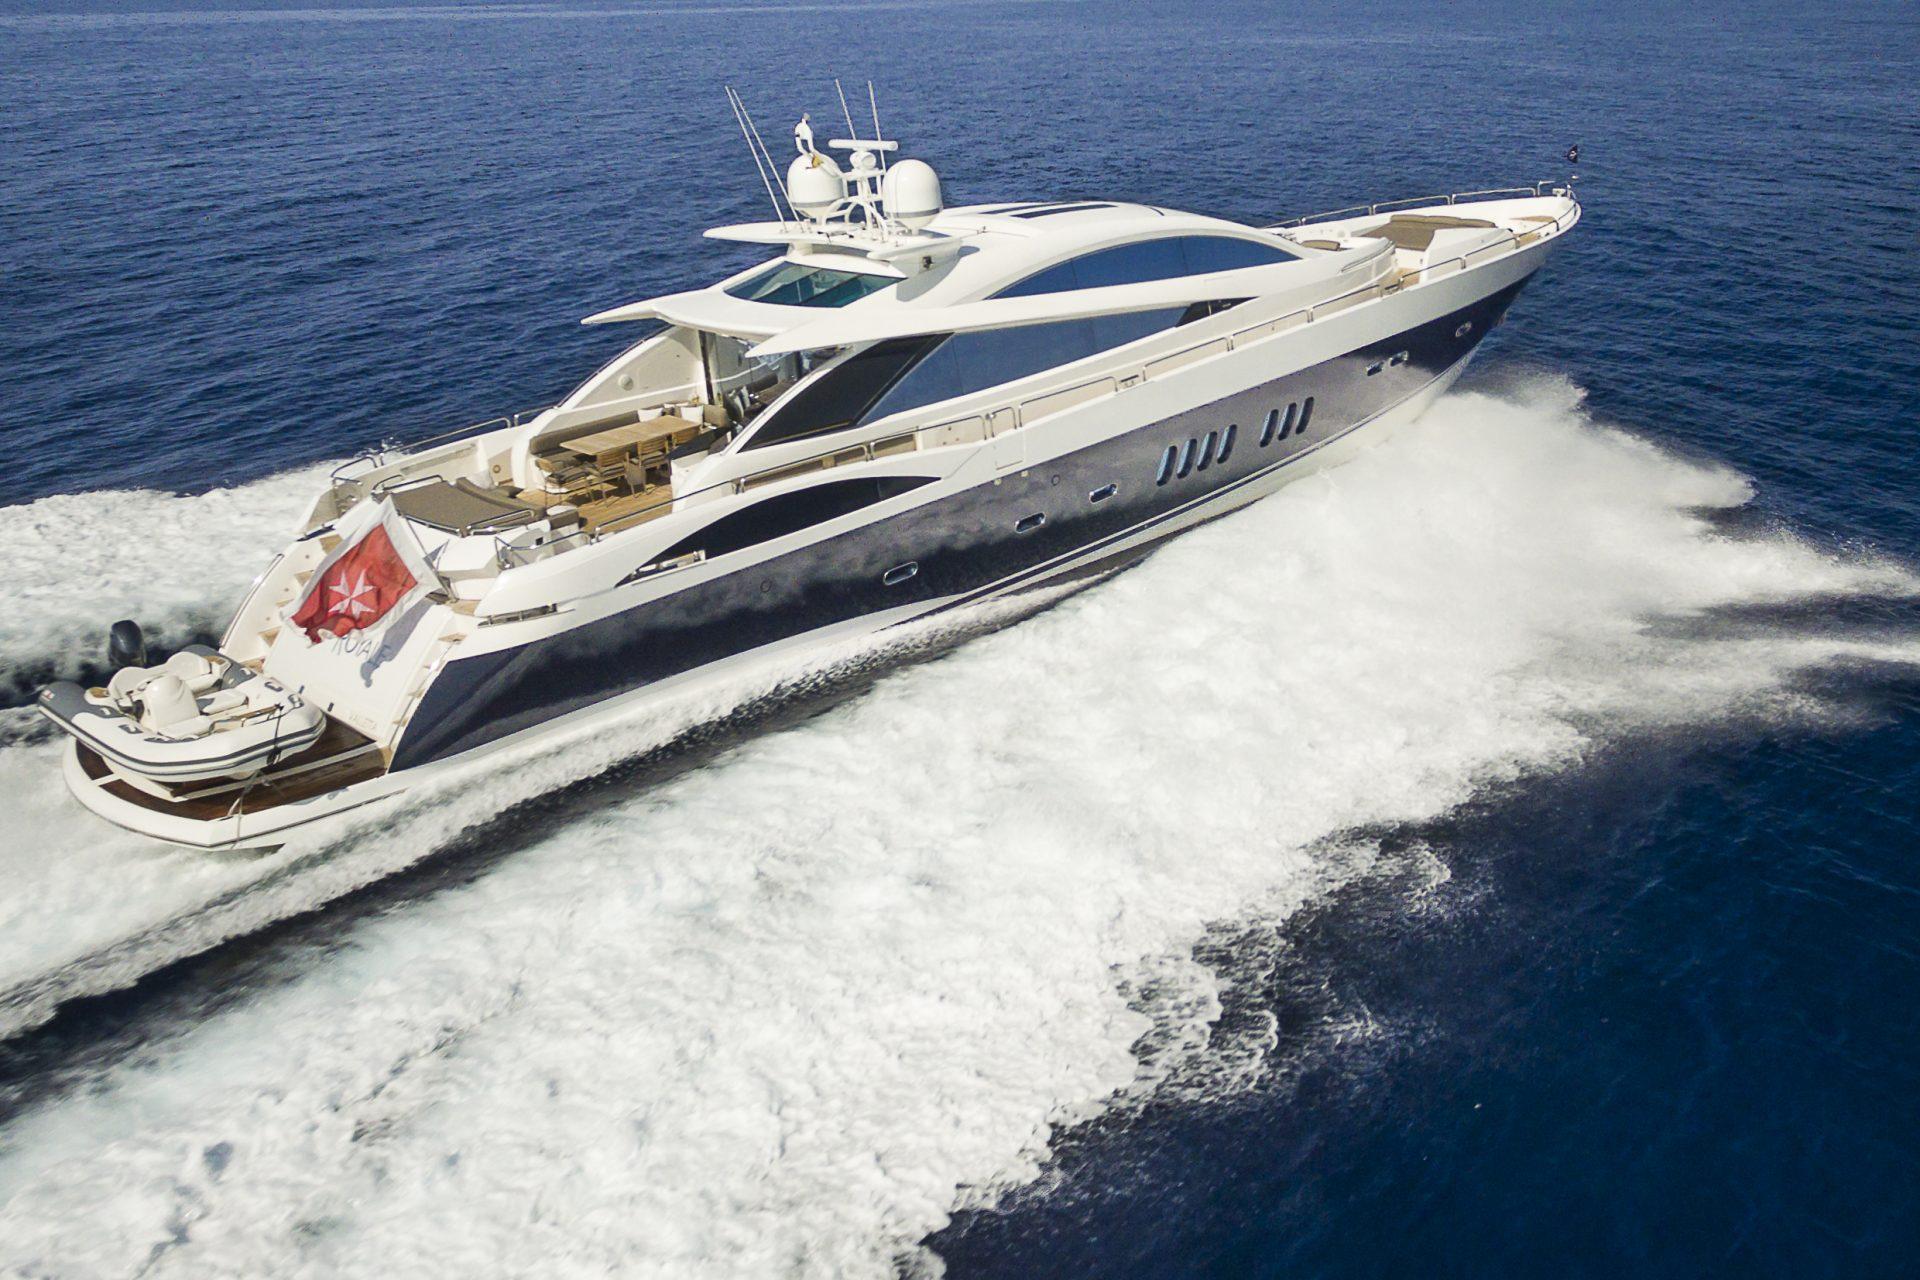 Casino royale yacht cost tigre casino argentina